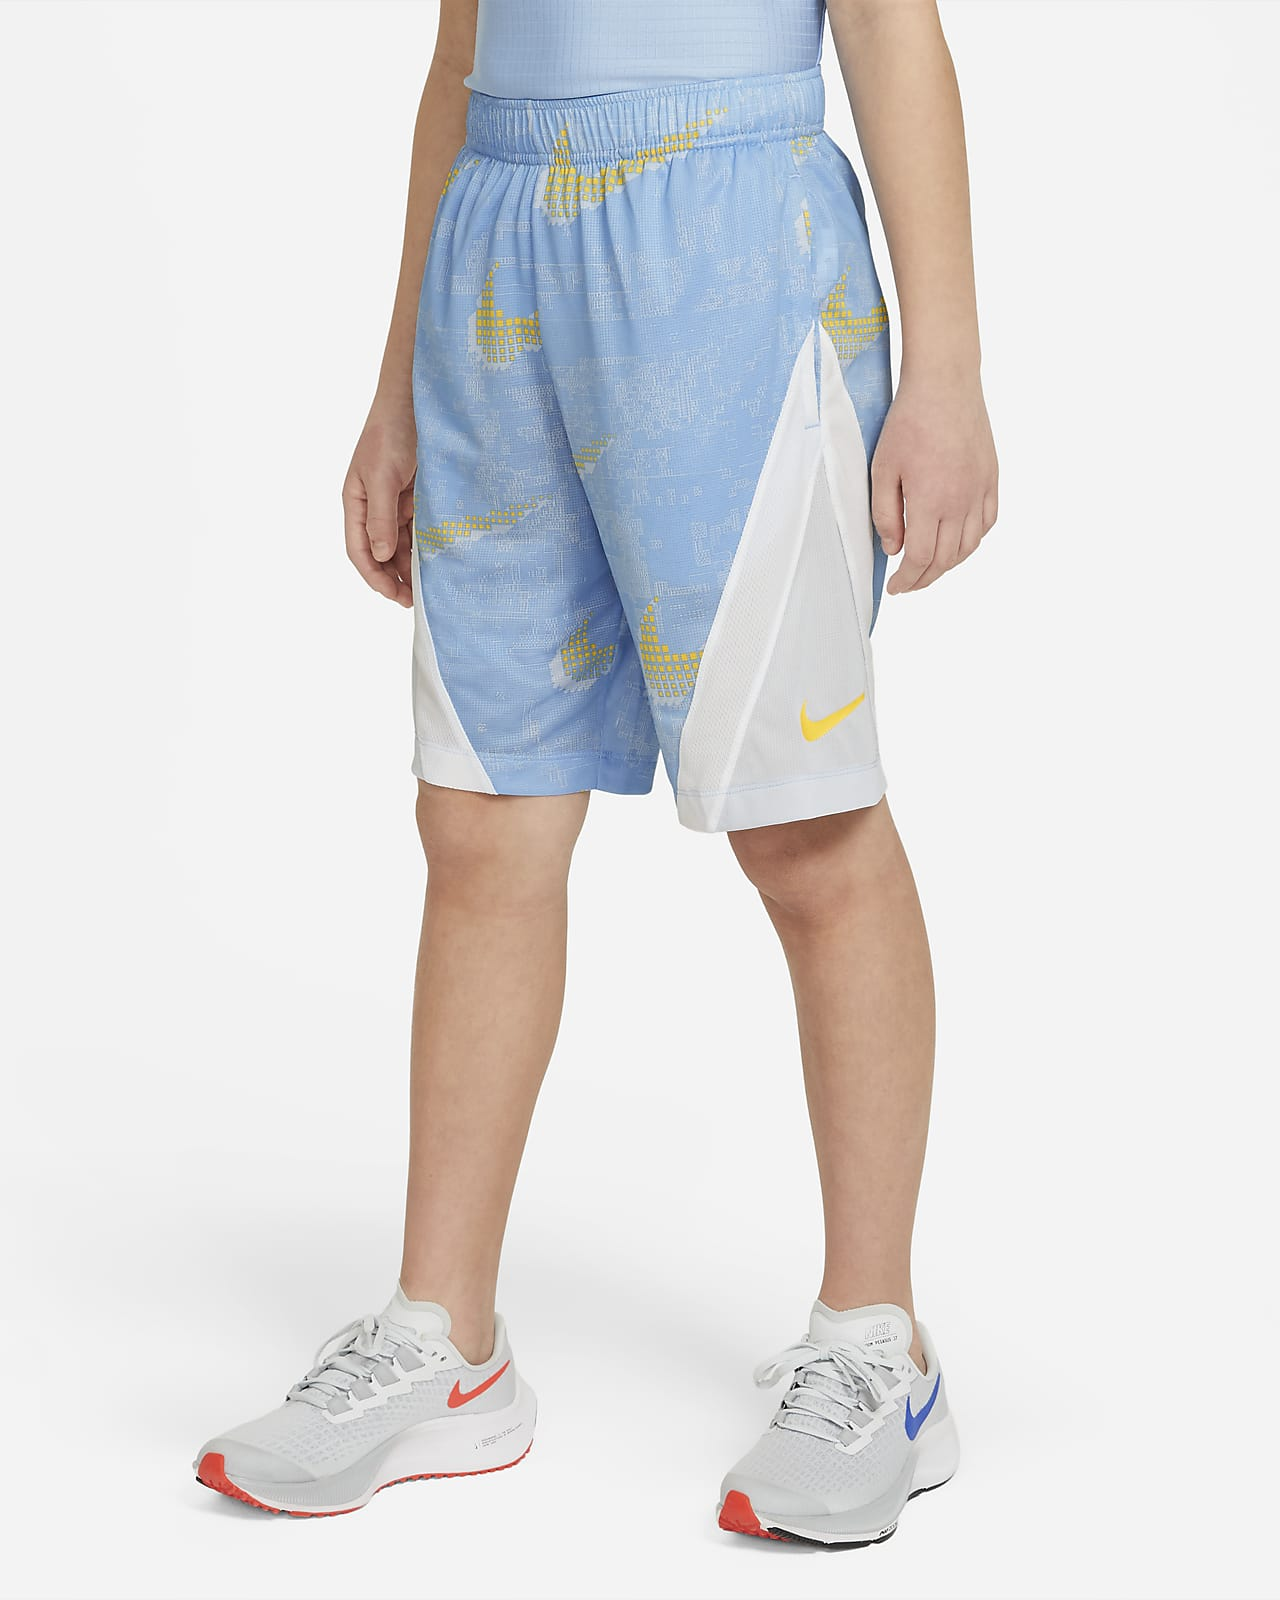 Nike Dominate Big Kids' (Boys') Printed Training Shorts